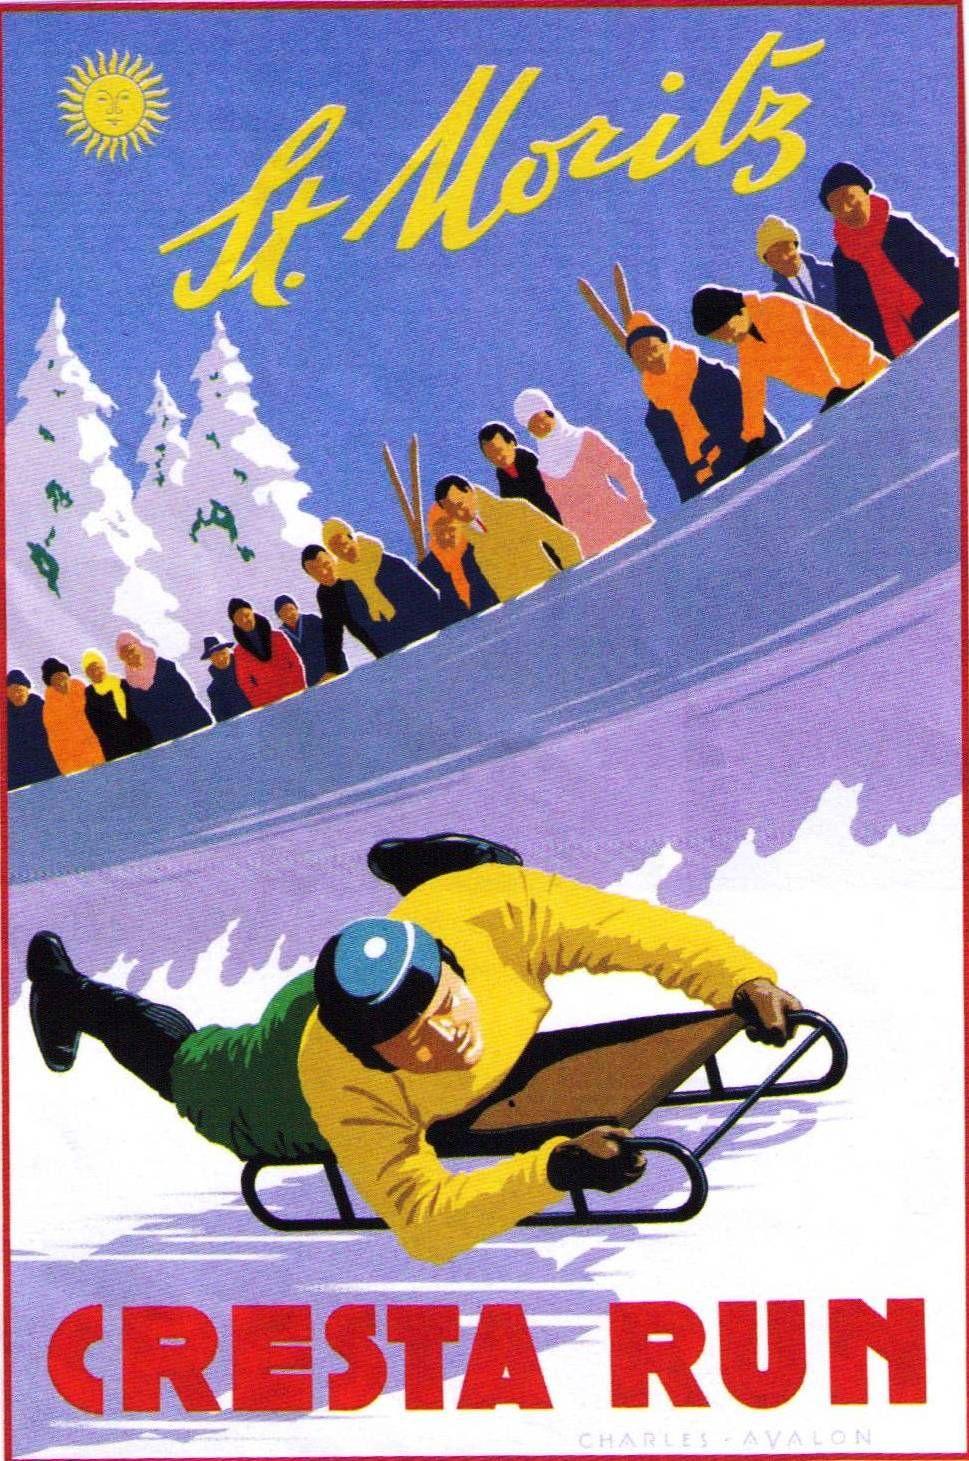 GIRL DOWNHILL SKIING SKI FUN ST MORITZ SWITZERLAND SPORT VINTAGE POSTER REPRO